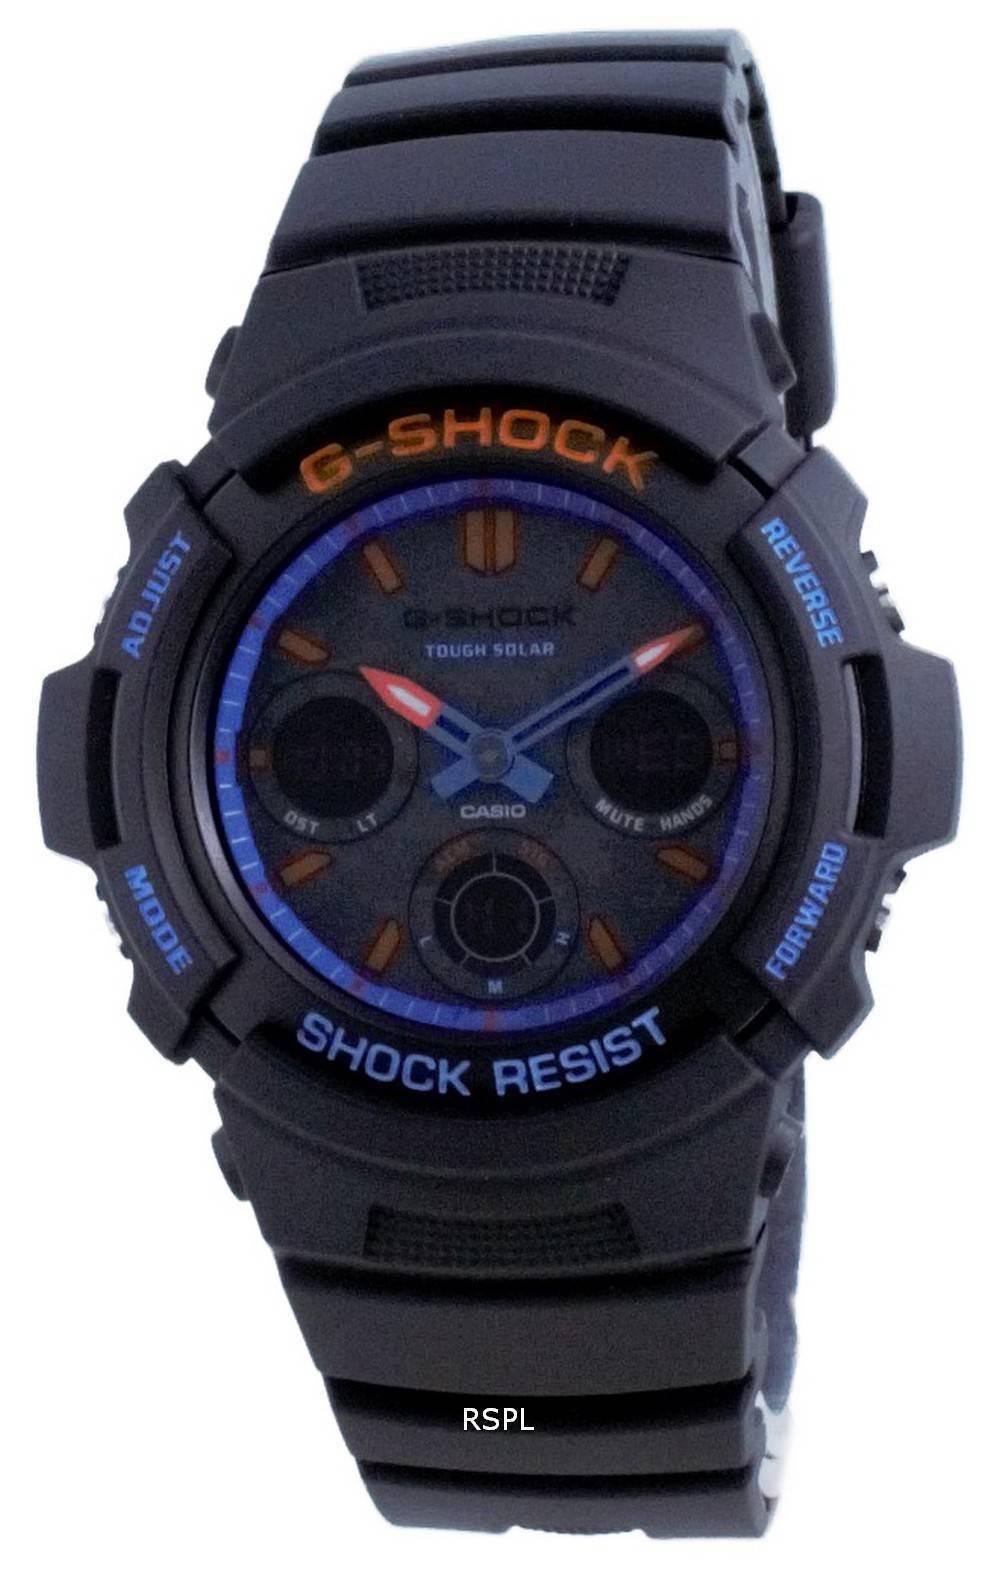 Casio G-Shock City analoginen digitaalinen sukeltajan kova aurinko AWR-M100SCT-1A AWRM100SCT-1 200M miesten kello